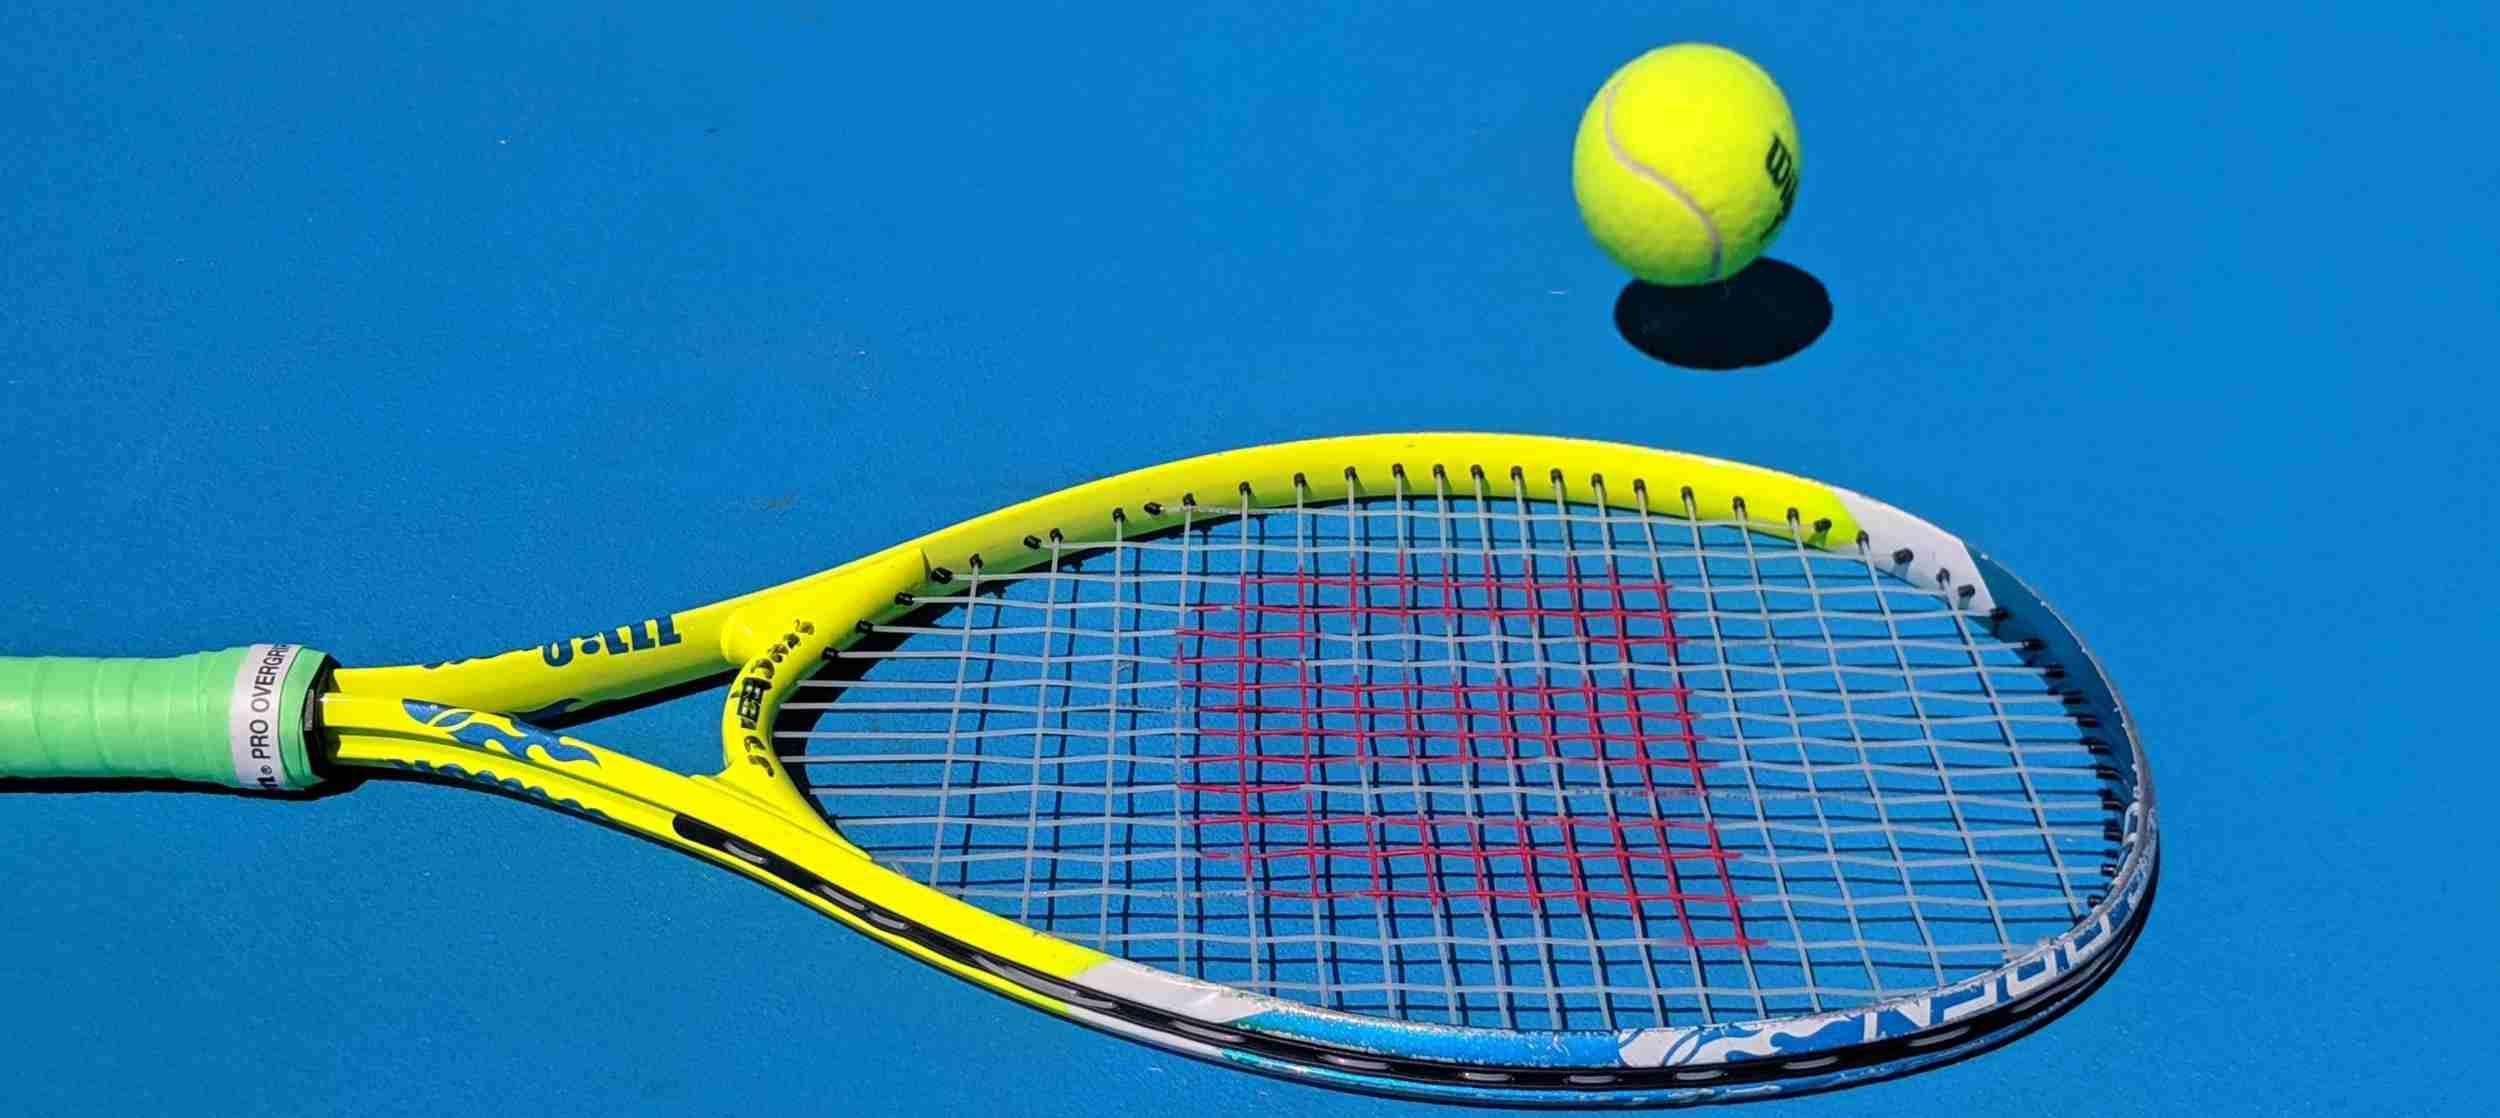 Image de Tennis